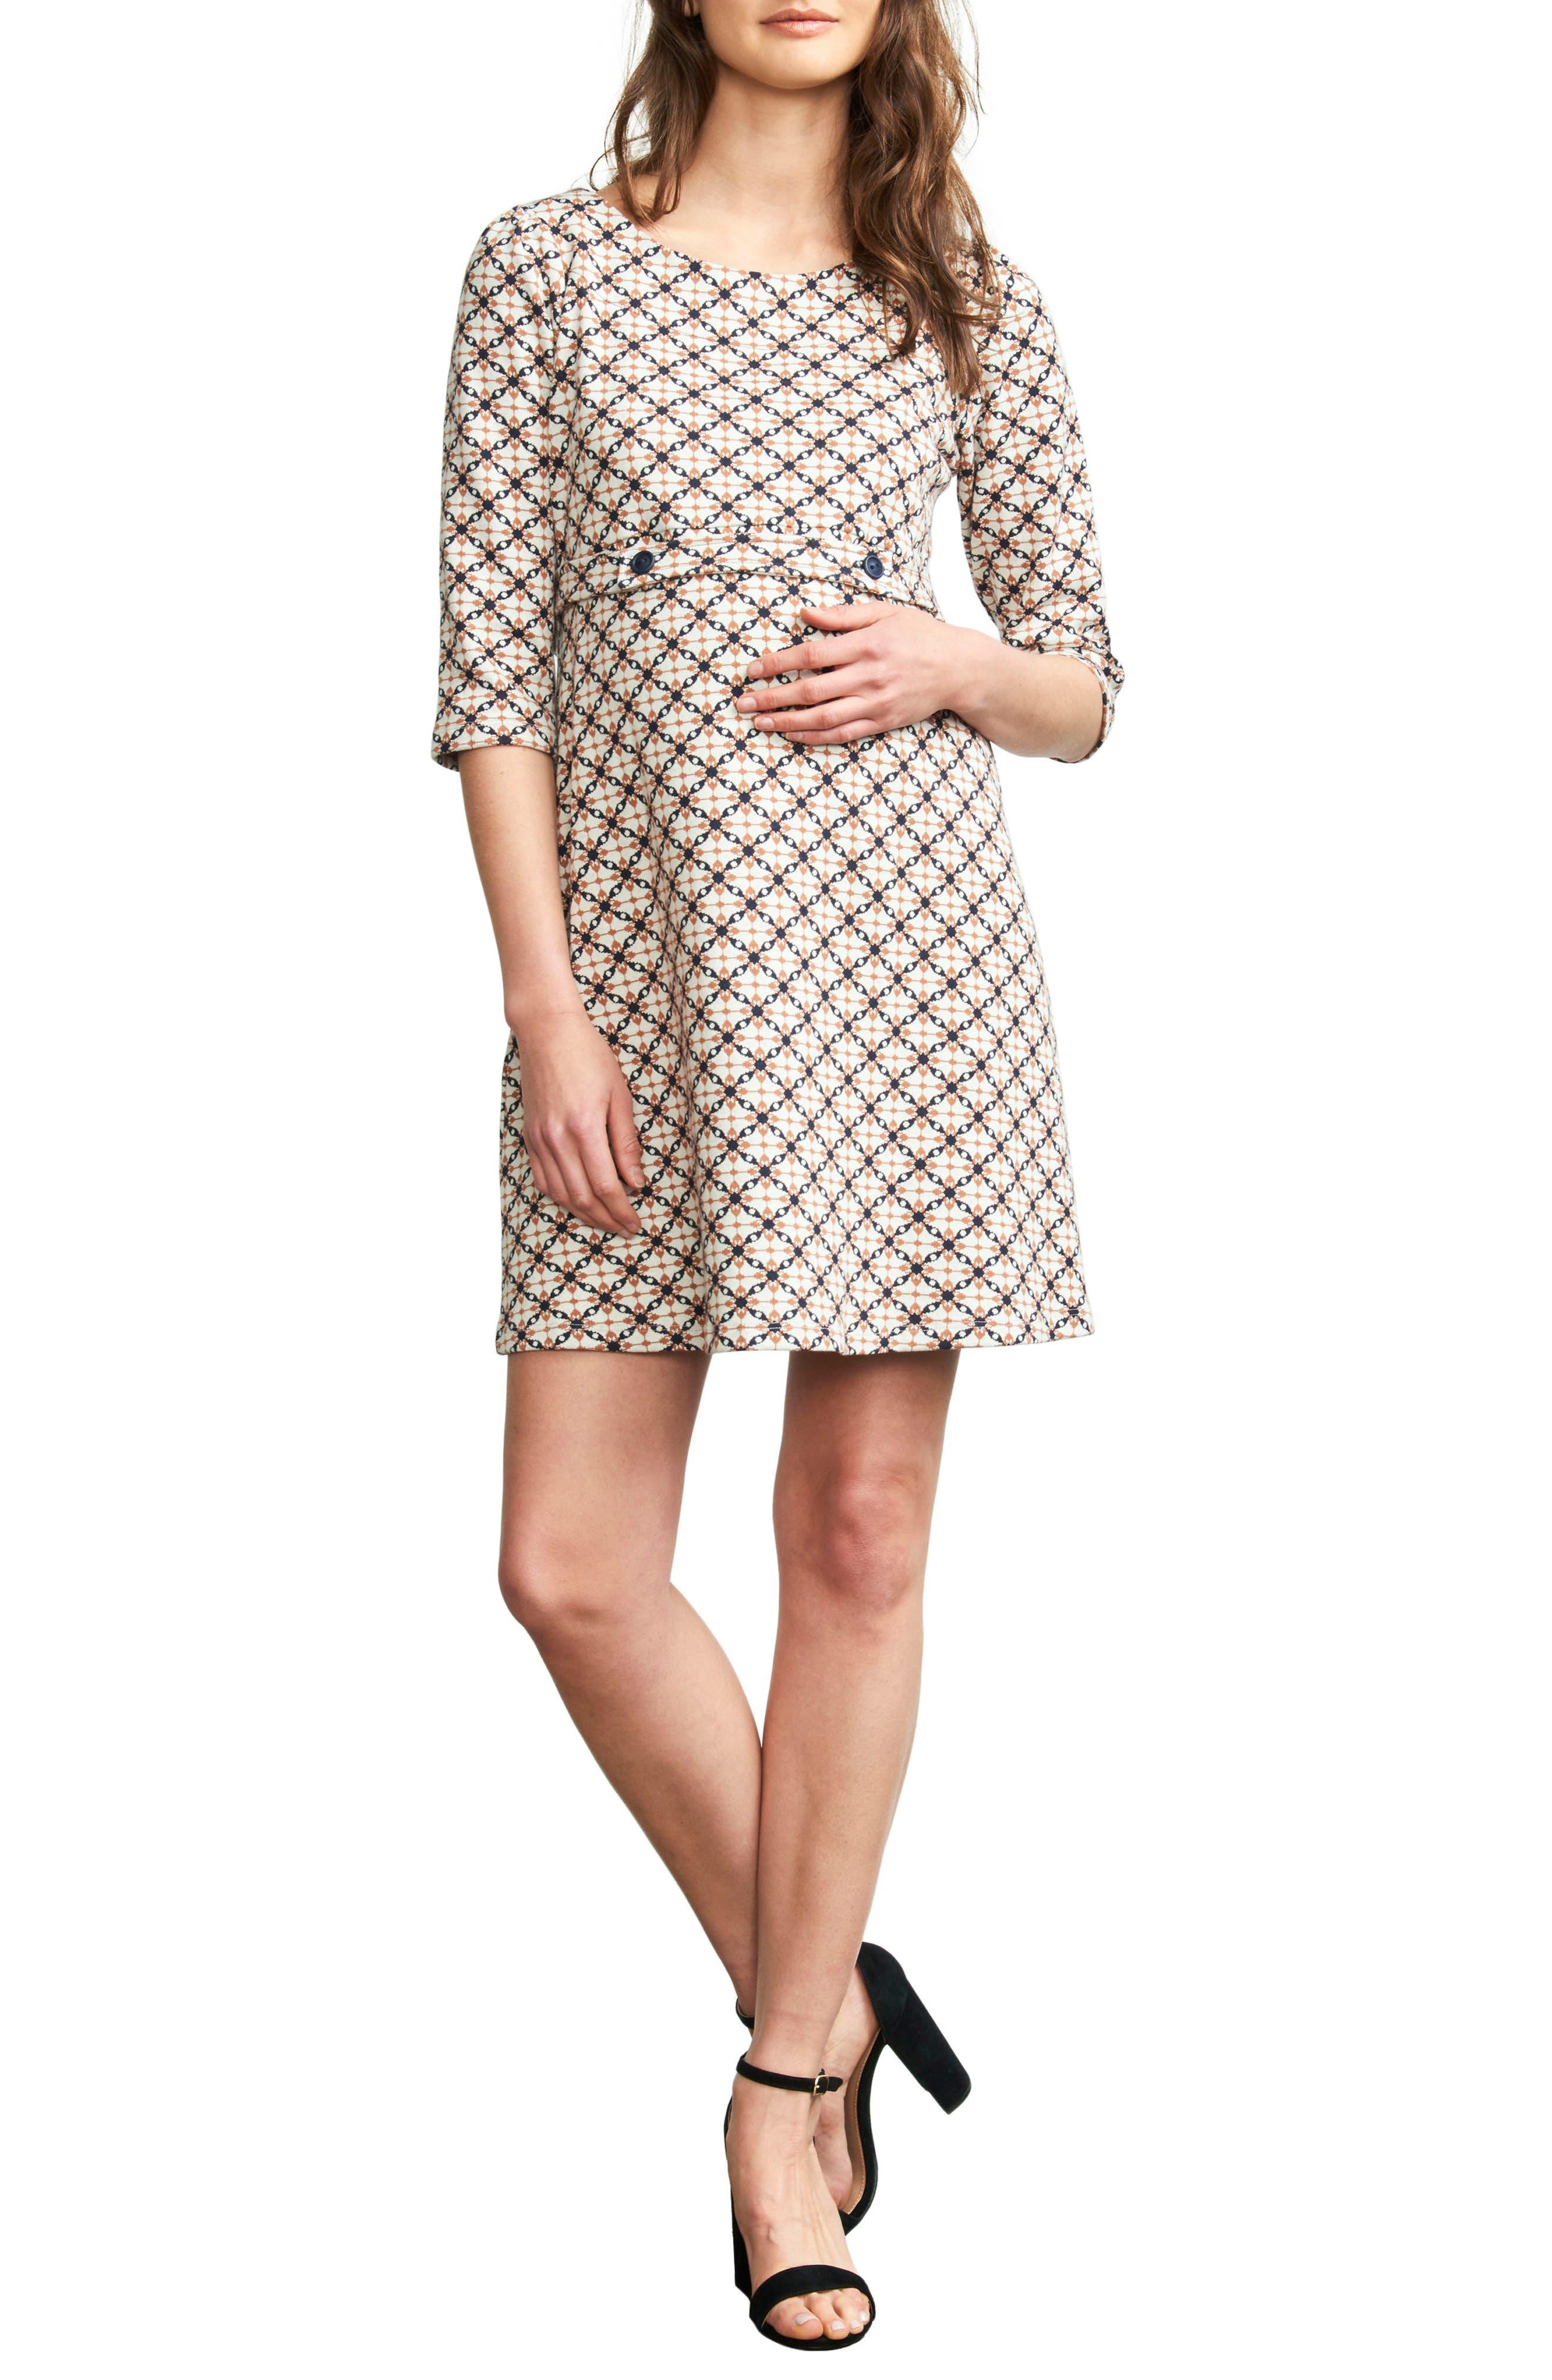 Button Band Maternity Dress,                             Main thumbnail 1, color,                             JACQUARD